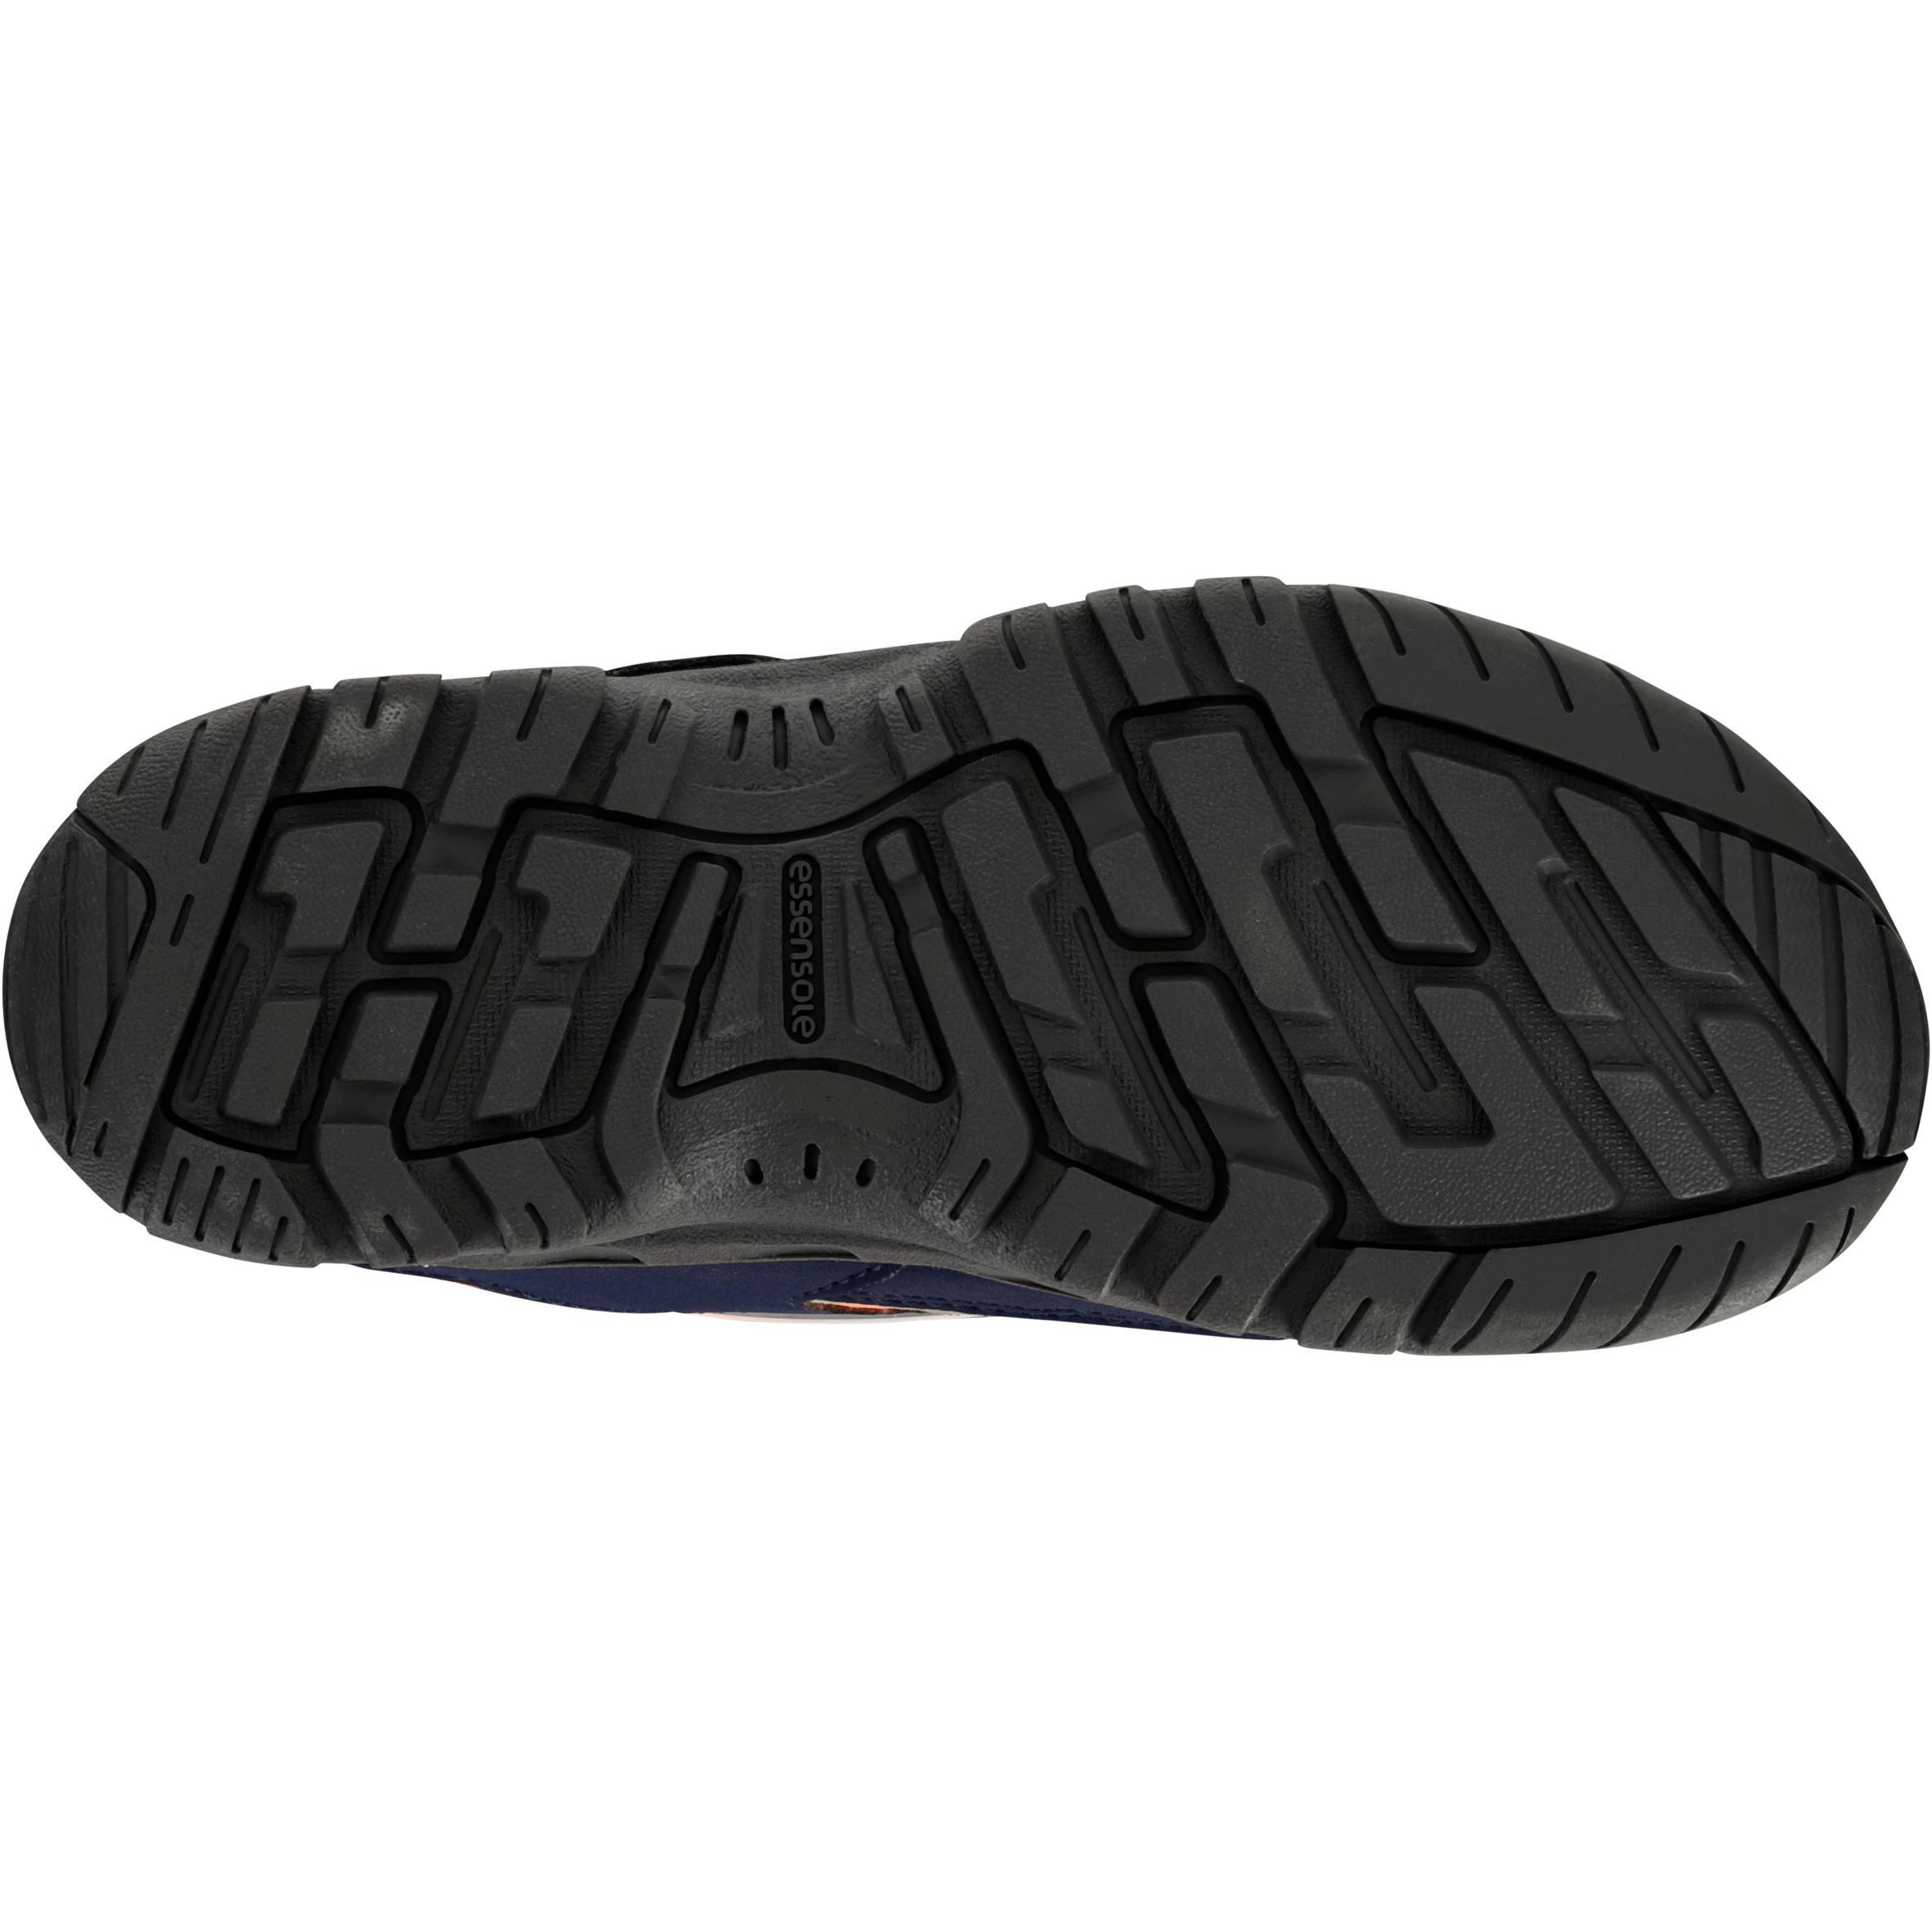 Kids Waterproof Hiking Shoes NH100 - Blue/Coral